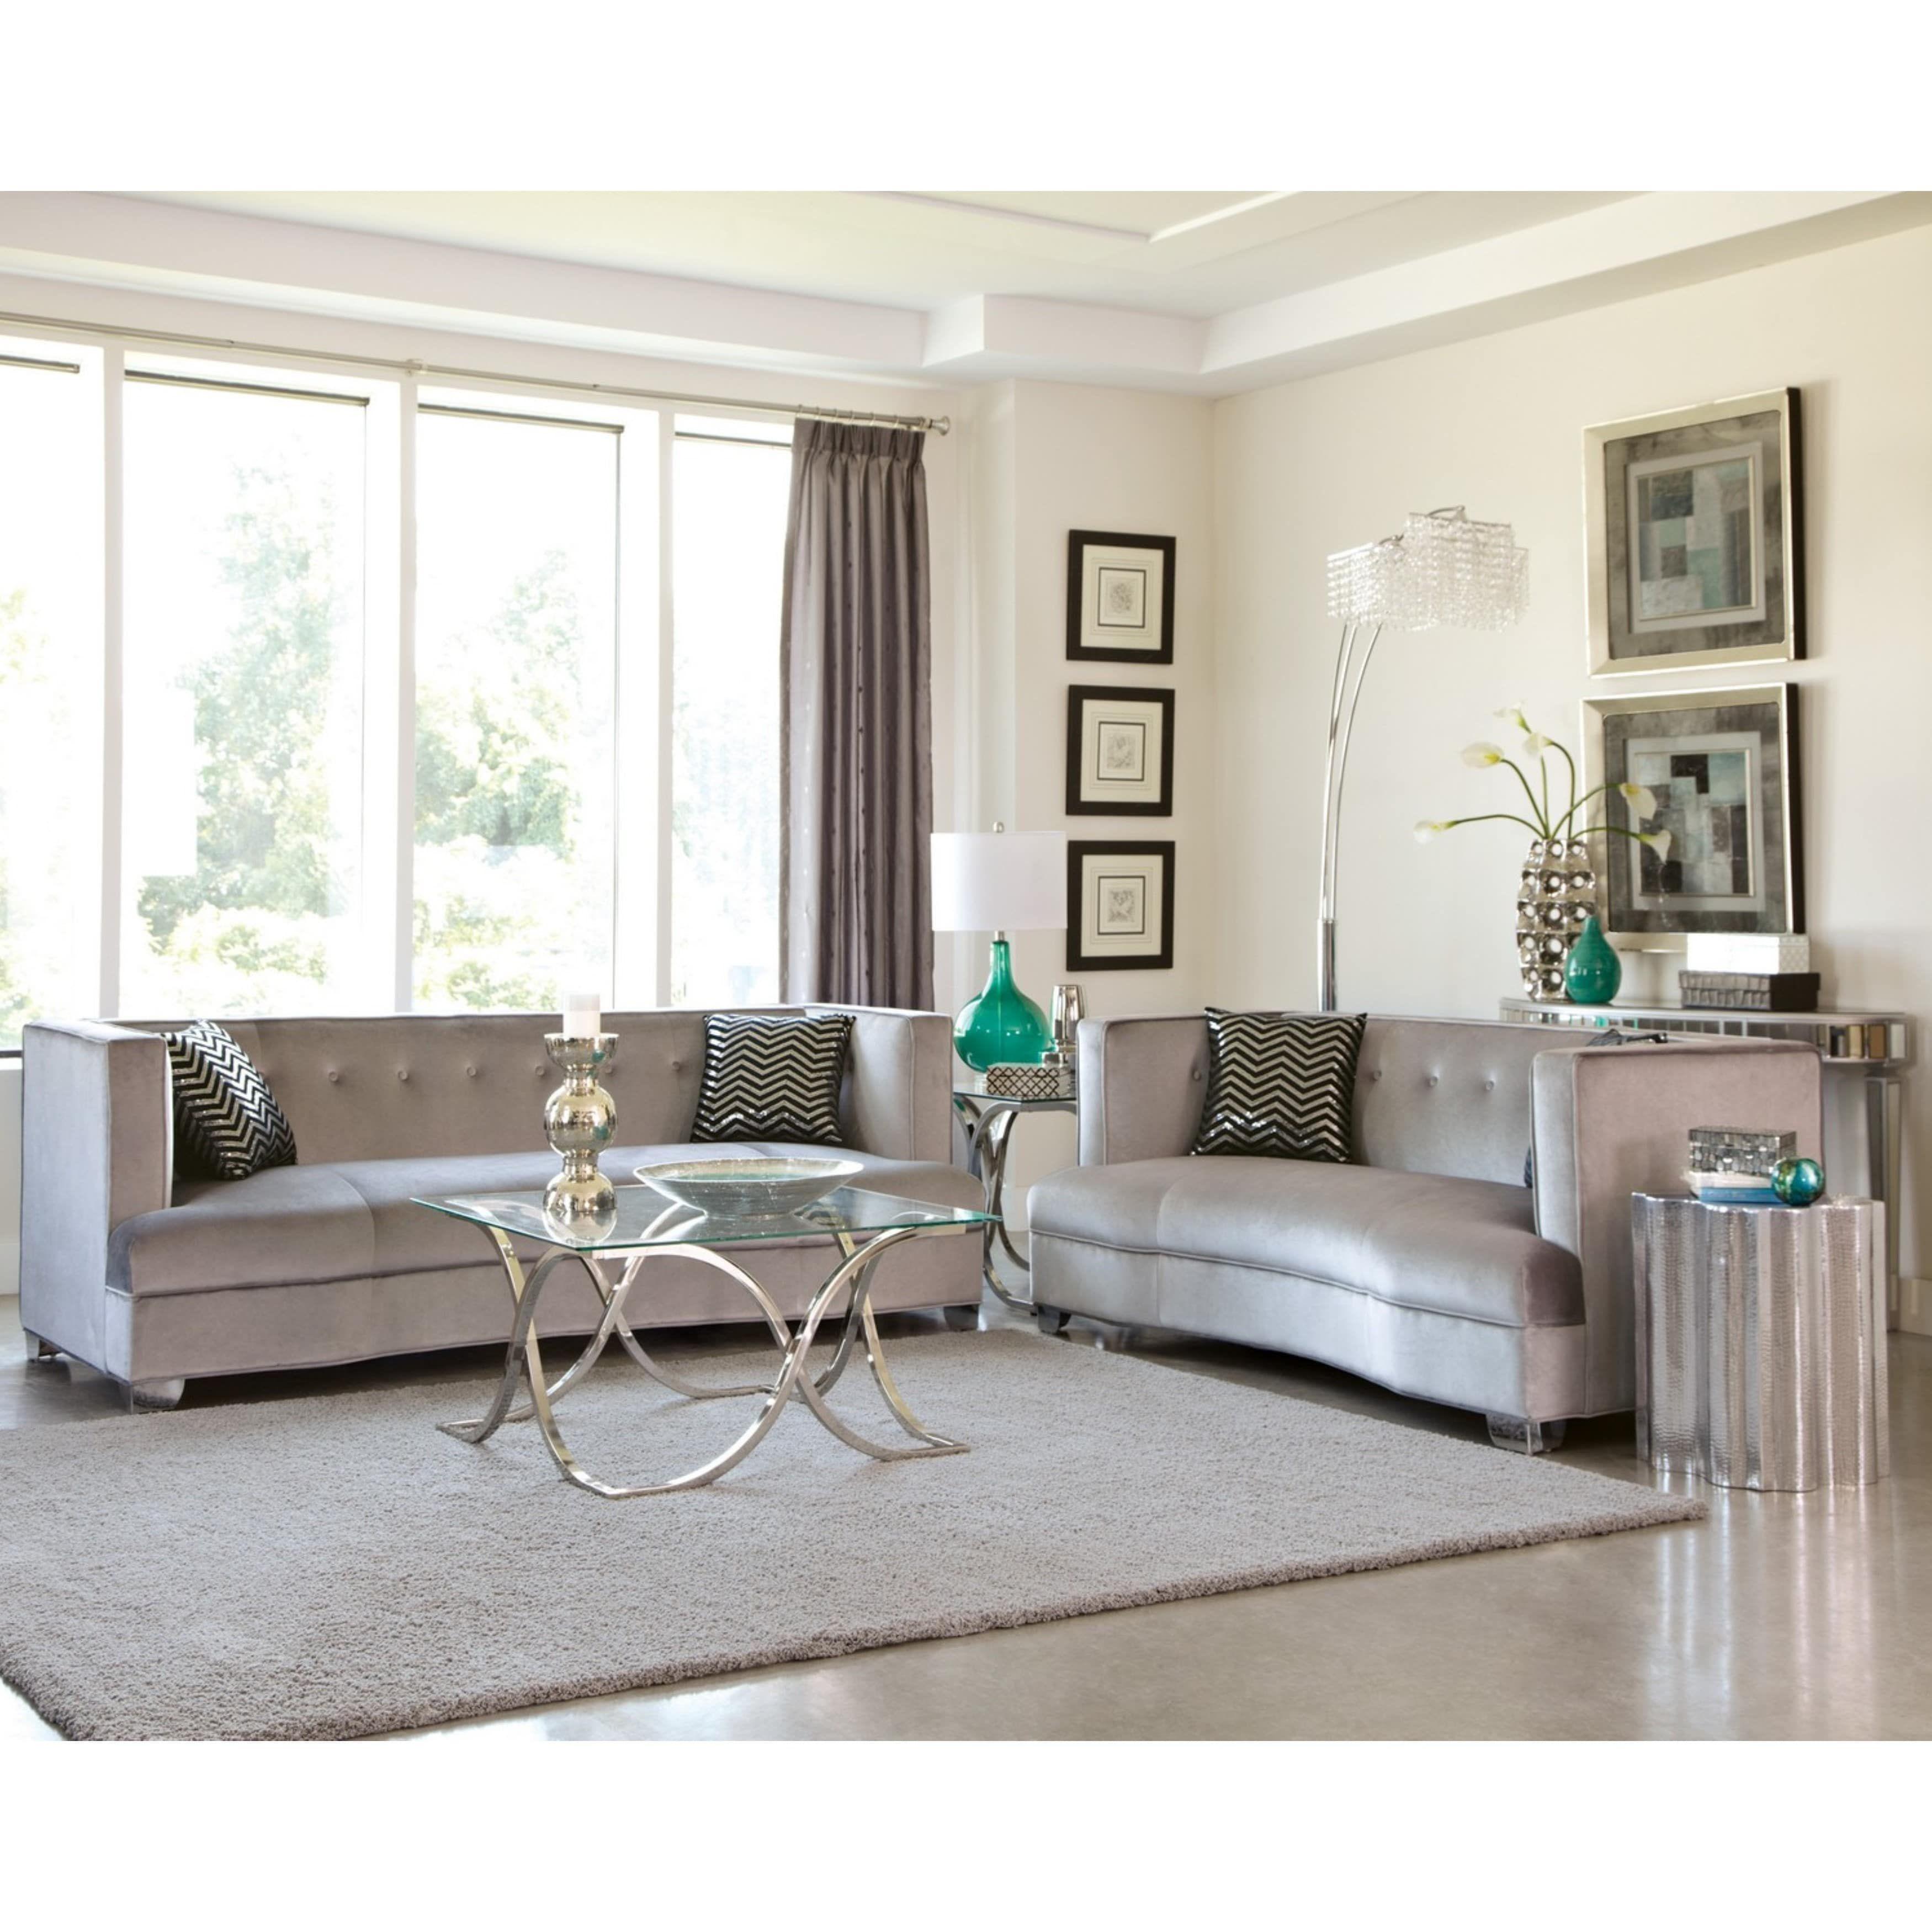 Modern design traditional influenced silver velvet living room sofa collection 1 sofa 1 loveseat